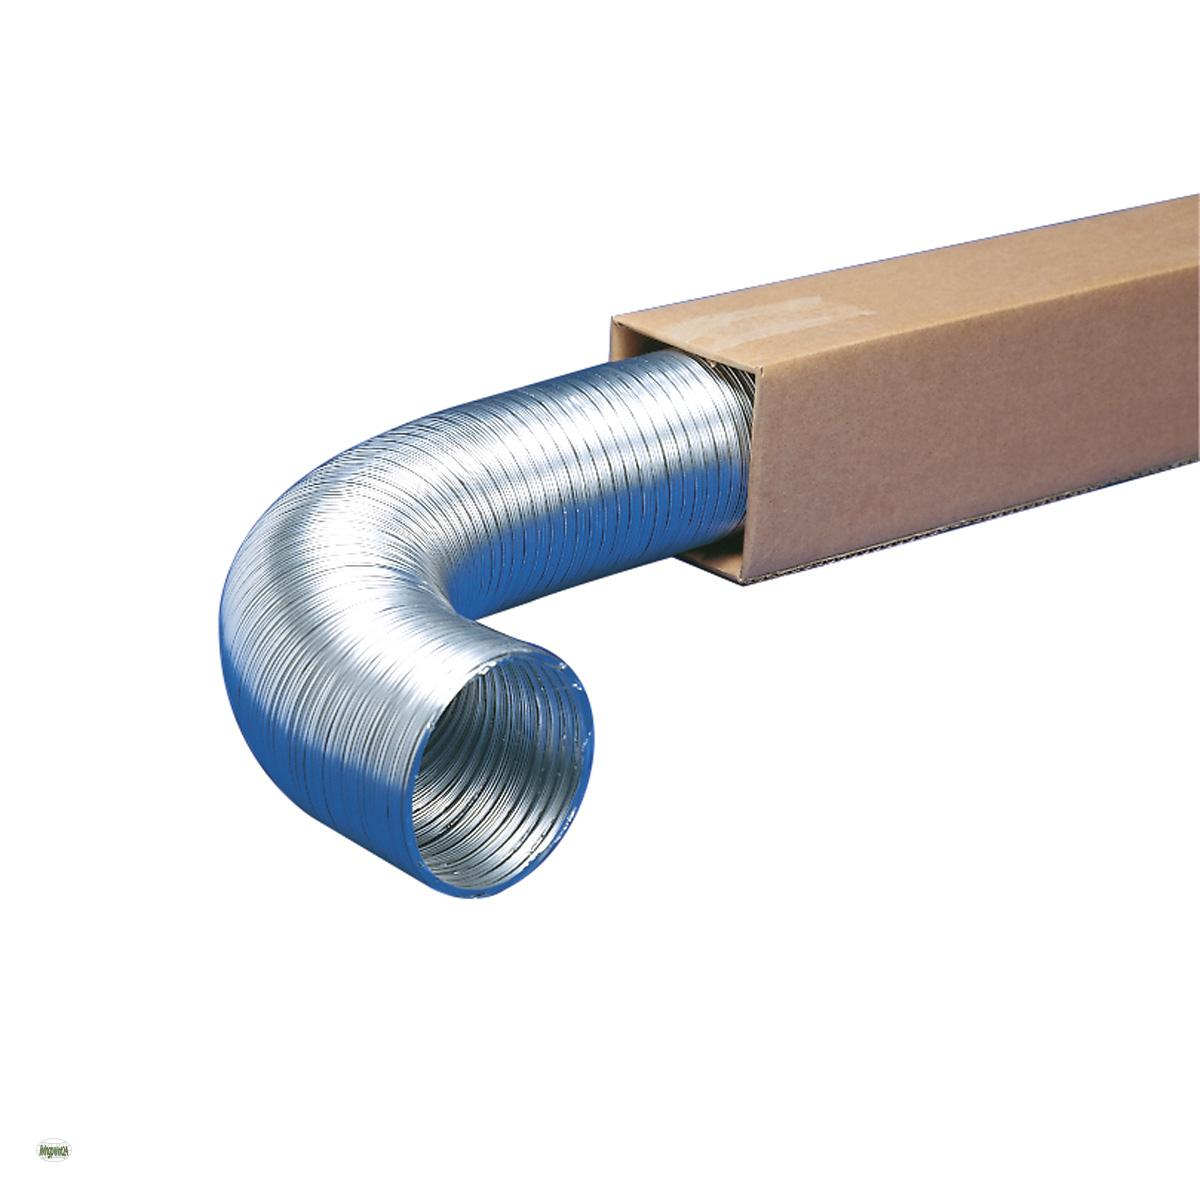 Tubo de alum nio para fazer flechas pictures to pin on - Tubo flexible aluminio ...